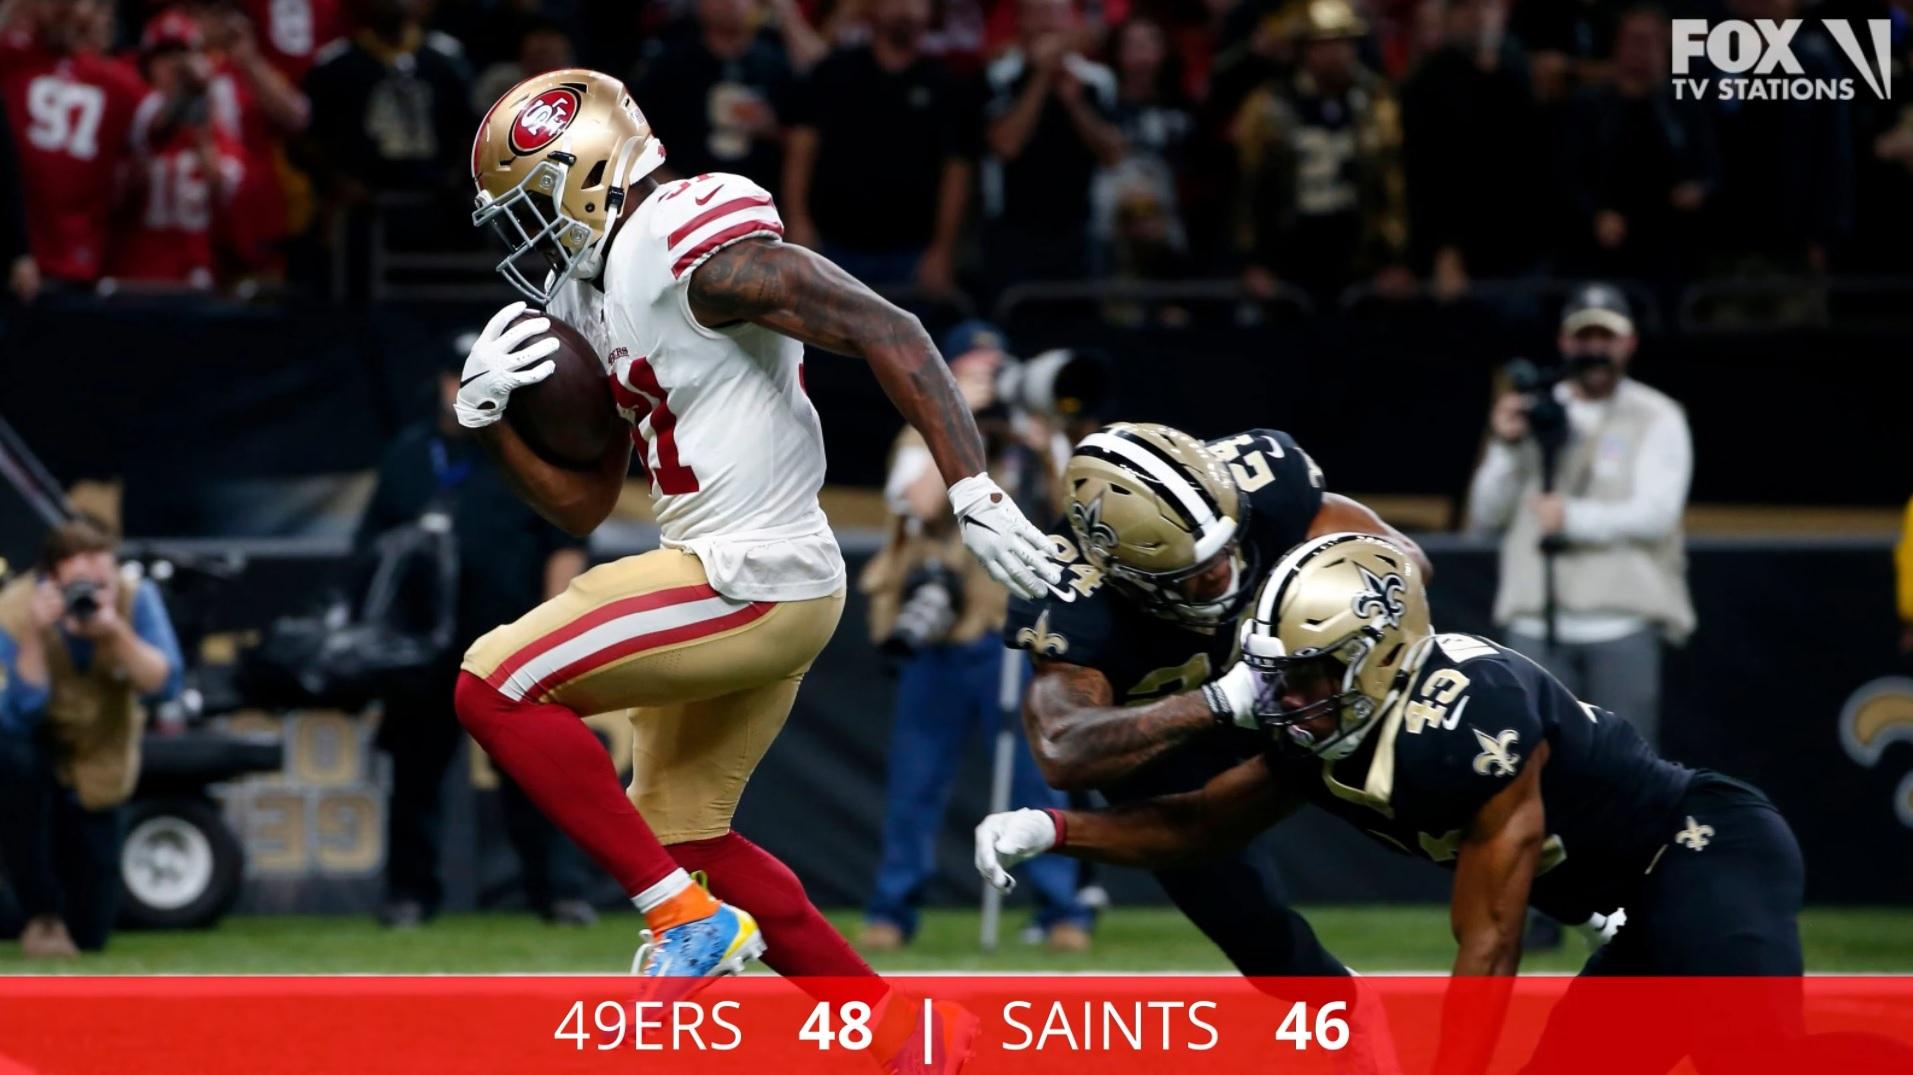 Gorropolo S 4 Td Passes Help 49ers Top Saints 48 46 Ktvu